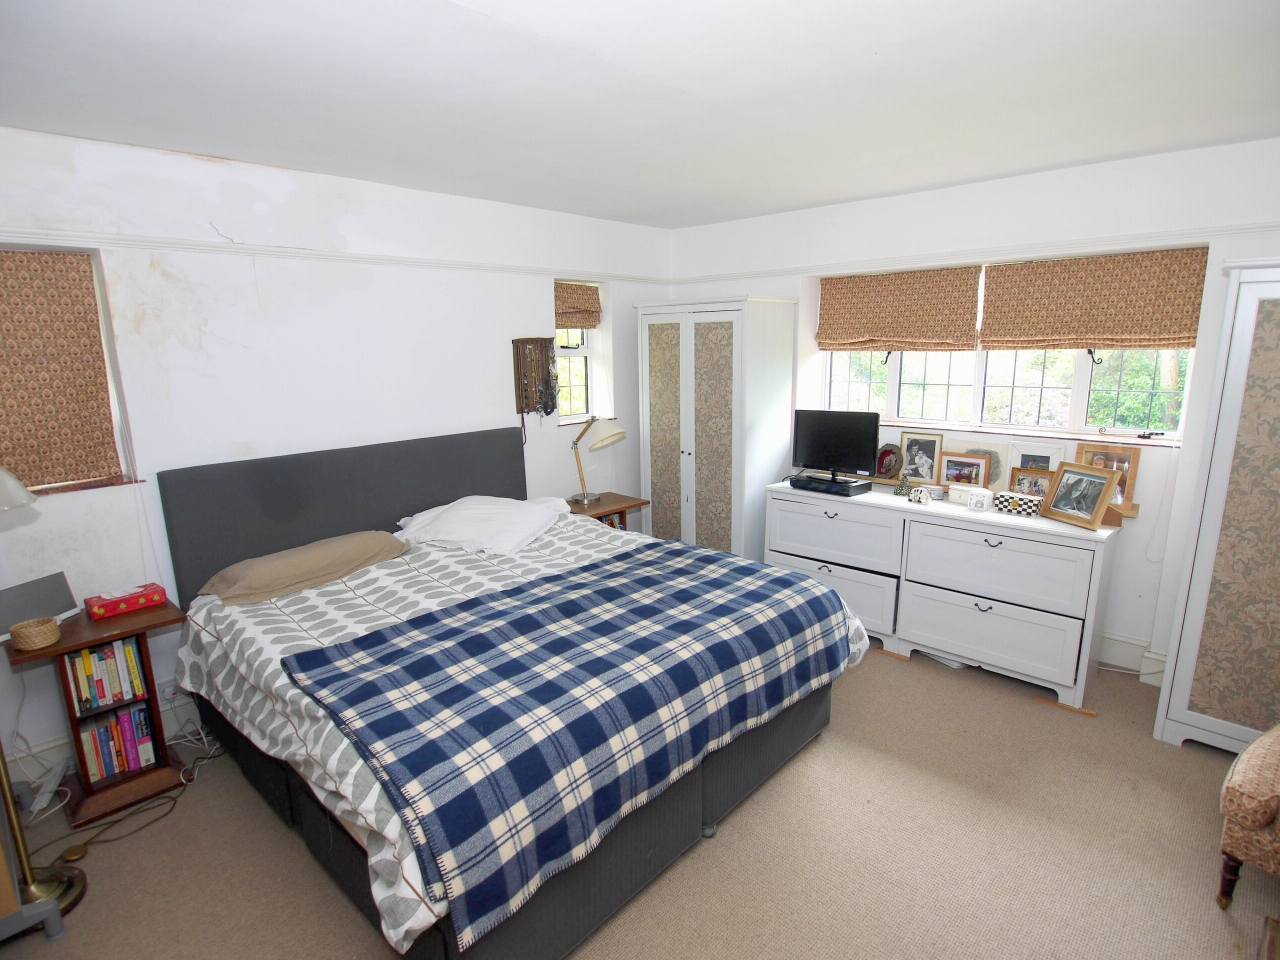 6 bedroom detached house Sold in Sevenoaks - Photograph 8